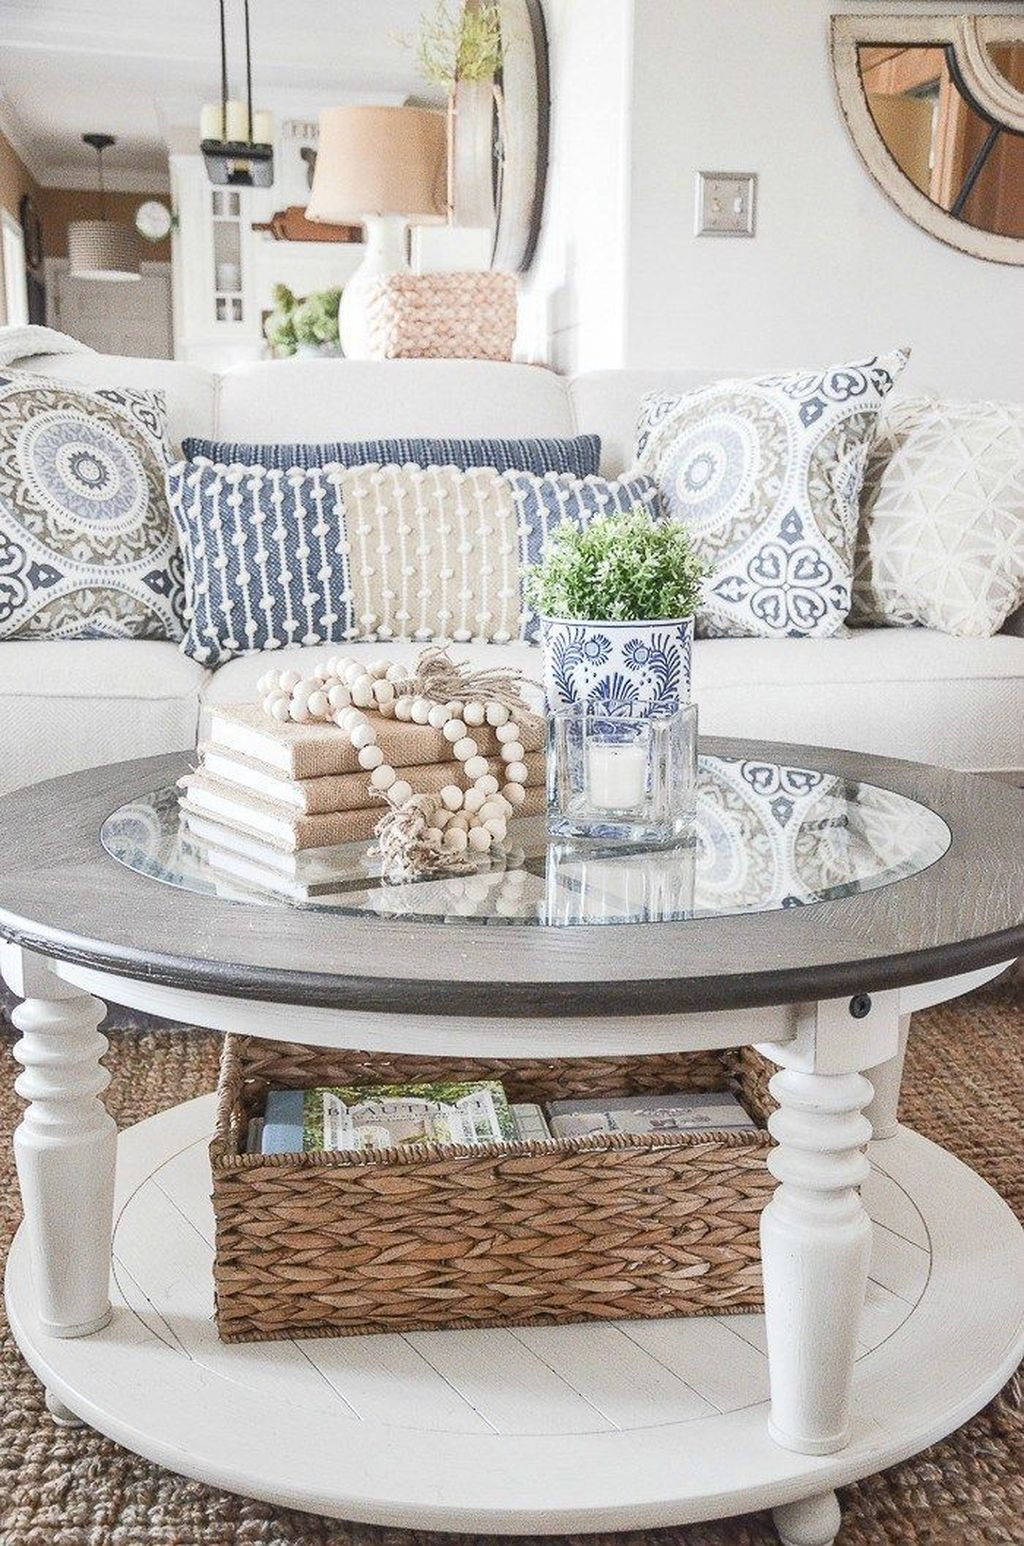 50 Popular Coffee Table Decor Ideas Roledecor Round Coffee Table Living Room Round Coffee Table Decor Coffee Table [ 1546 x 1024 Pixel ]